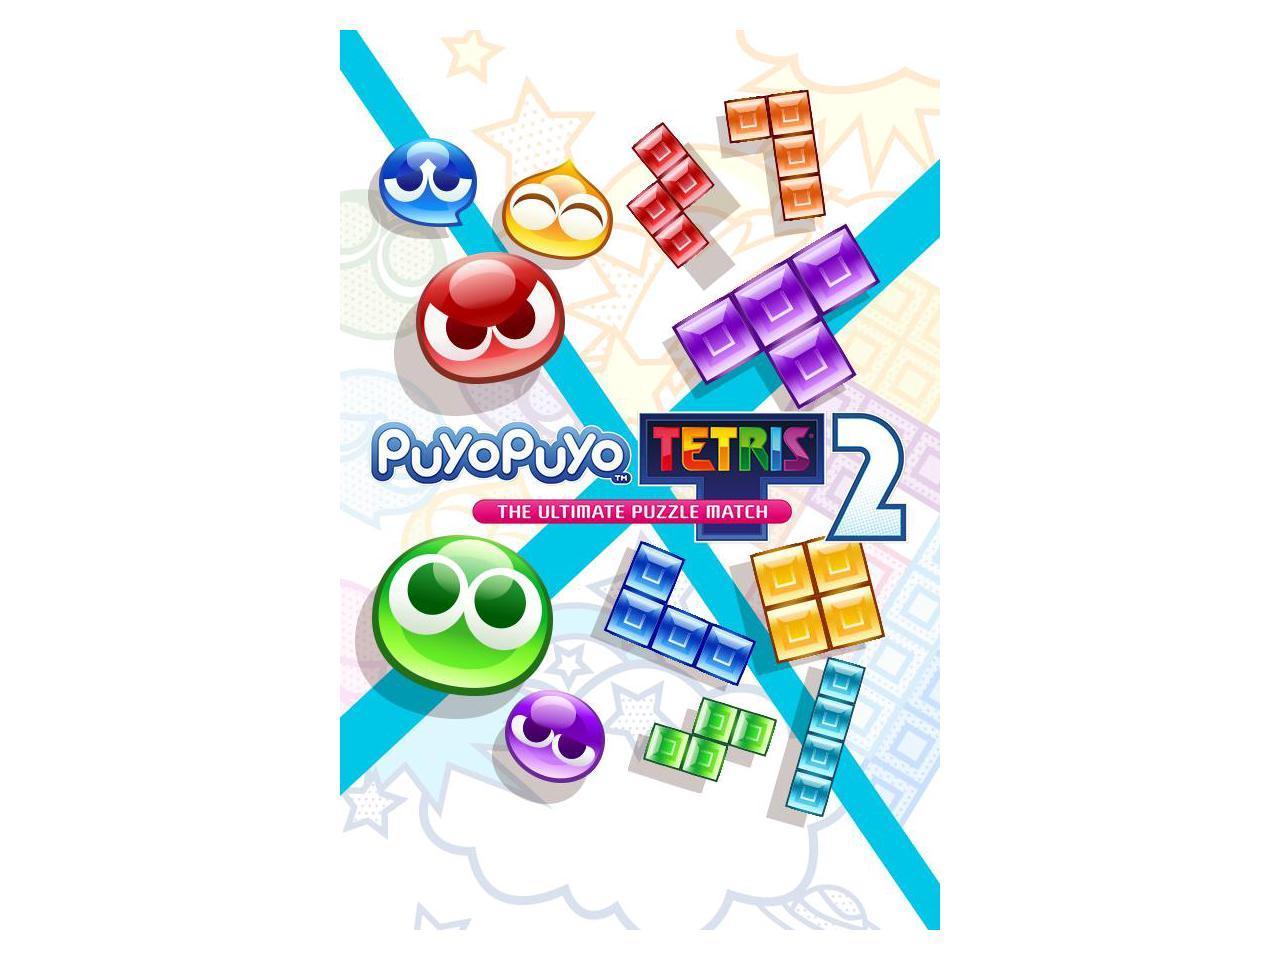 PC Digital Games SALE: Puyo Puyo Tetris 2 $13.49, SEGA Mega Drive and Genesis Classics $6.79 & More